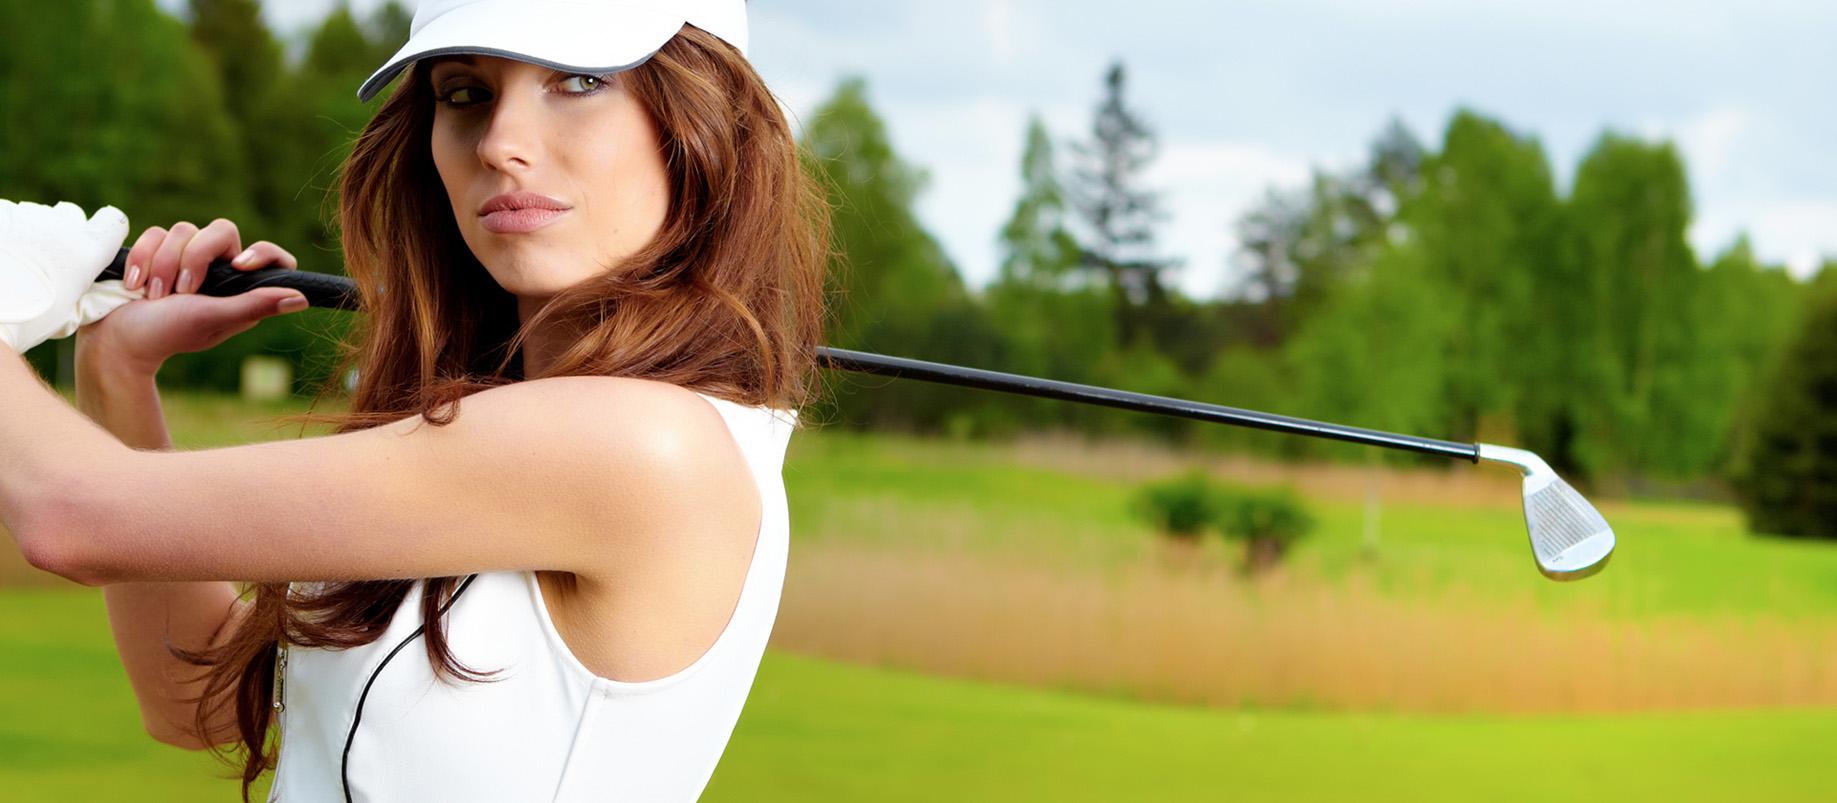 club desire, club lust, Golf tournament banner